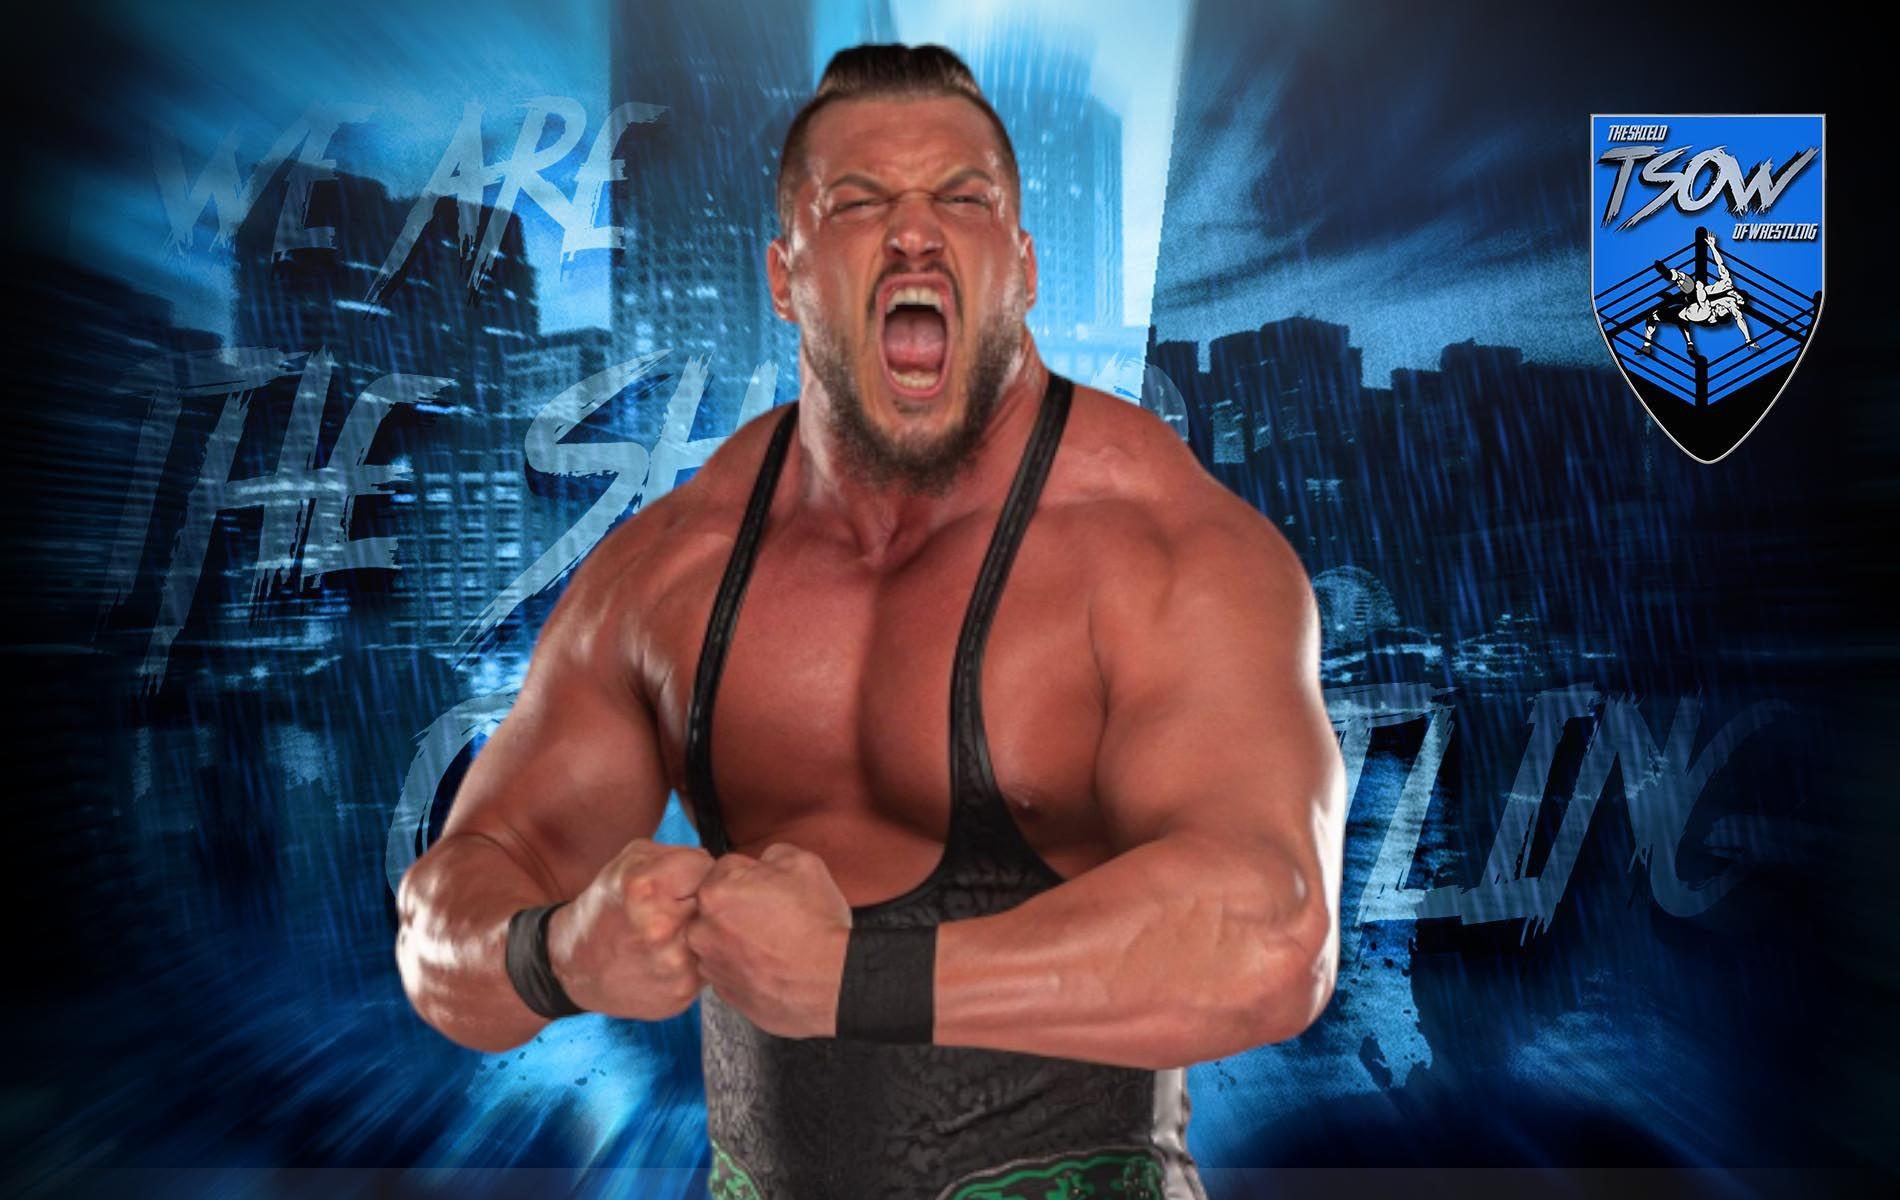 Wardlow: Jim Ross lo paragona a Batista